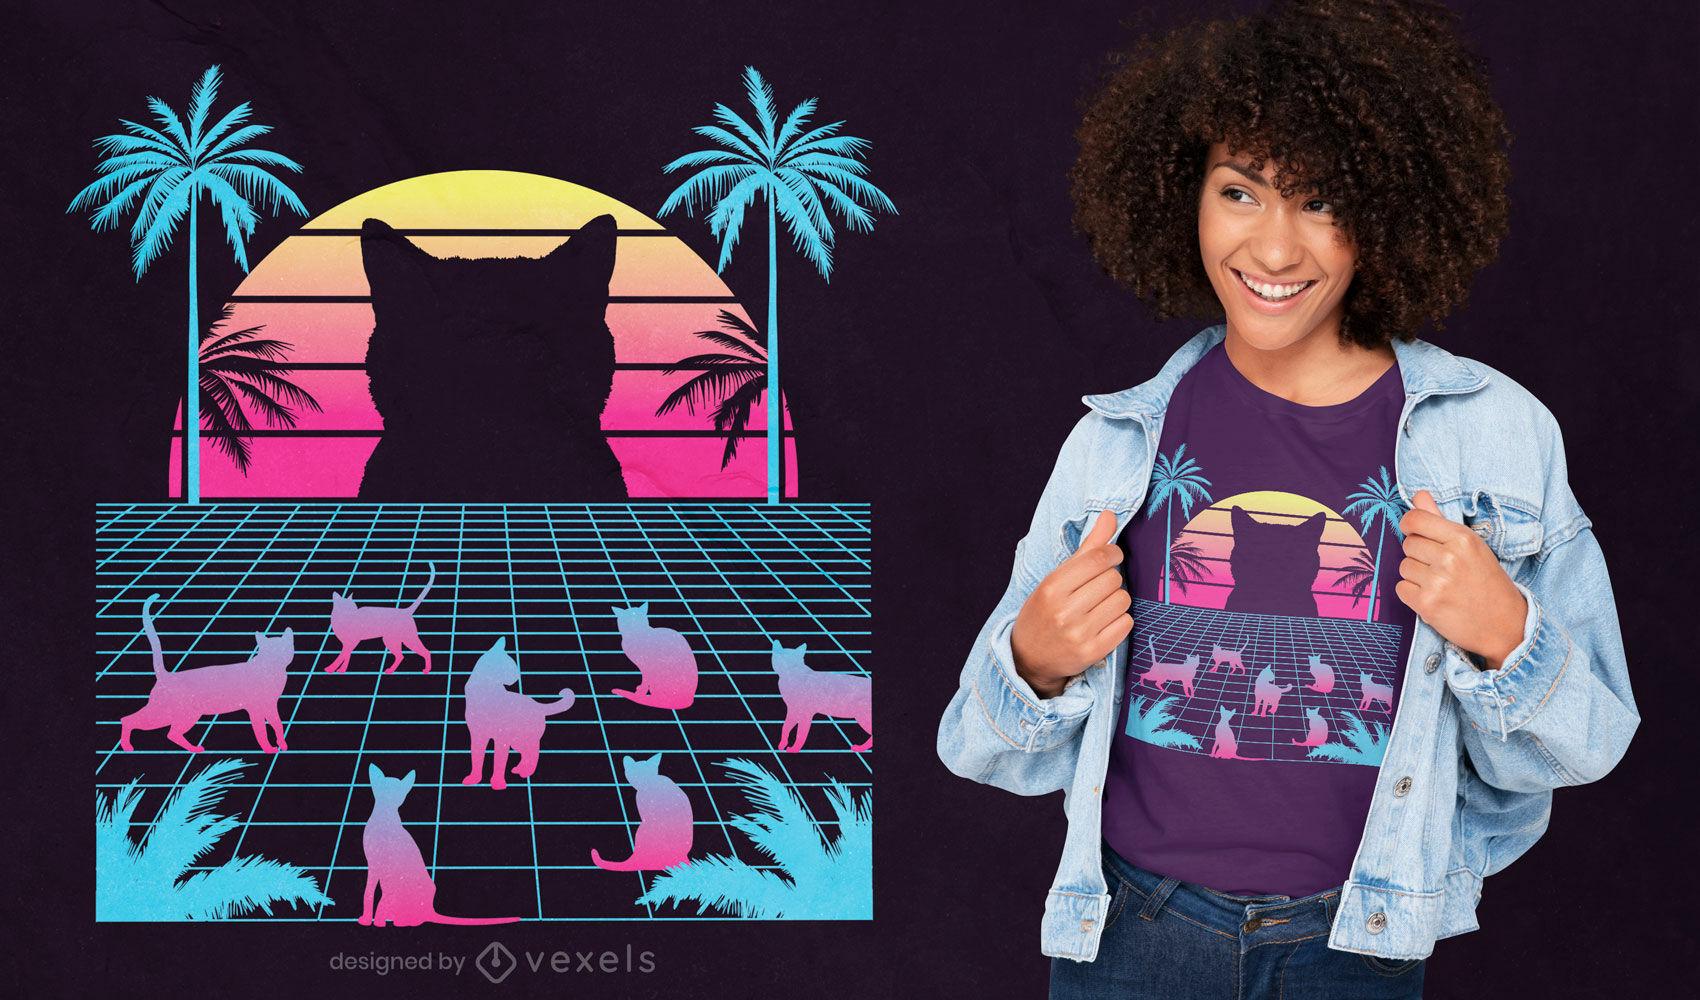 Dise?o de camiseta Cats vaporwave.